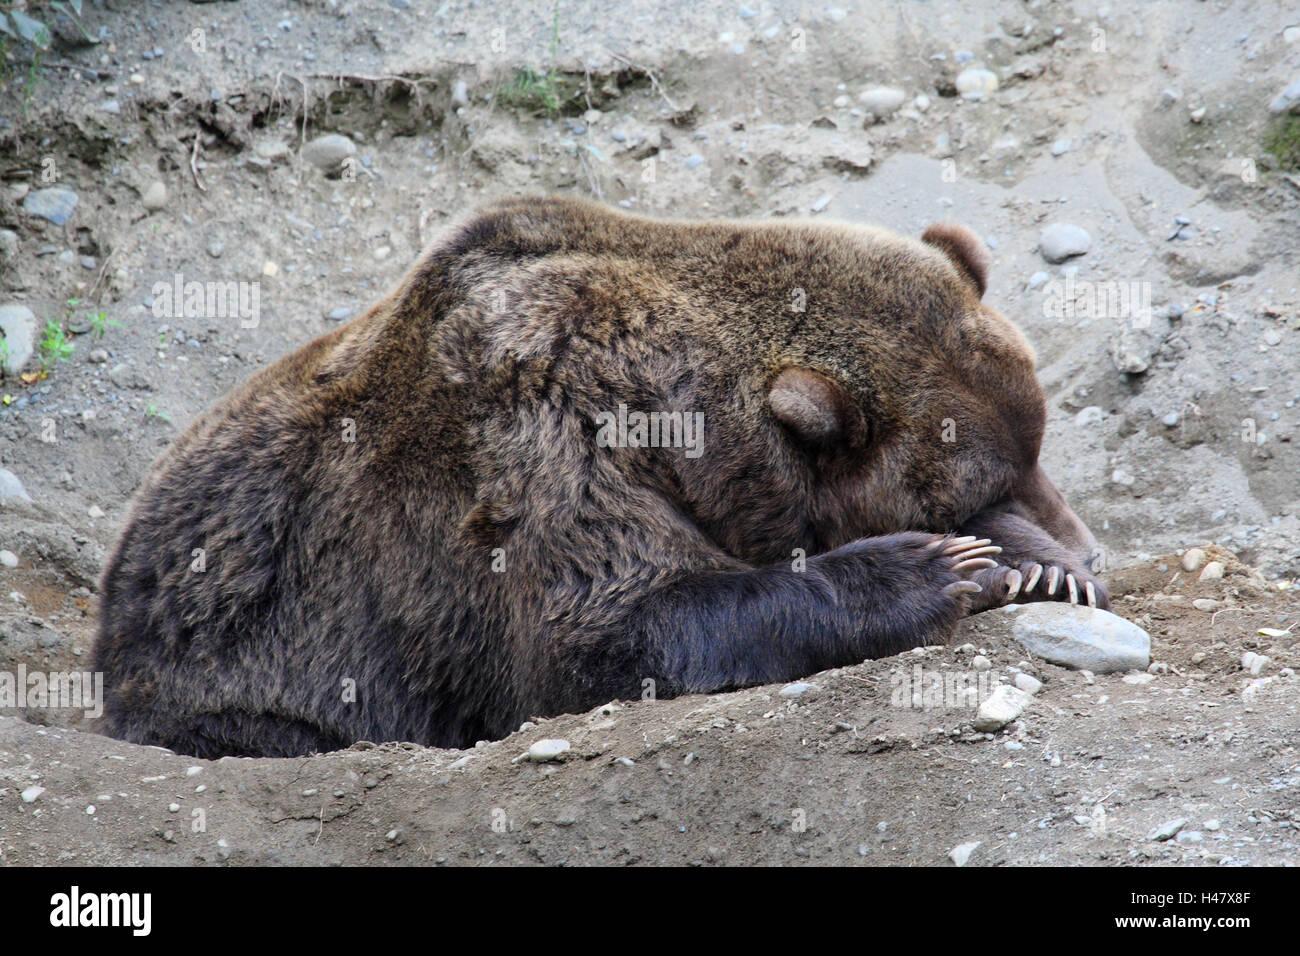 Grizzly bear, asleep, - Stock Image